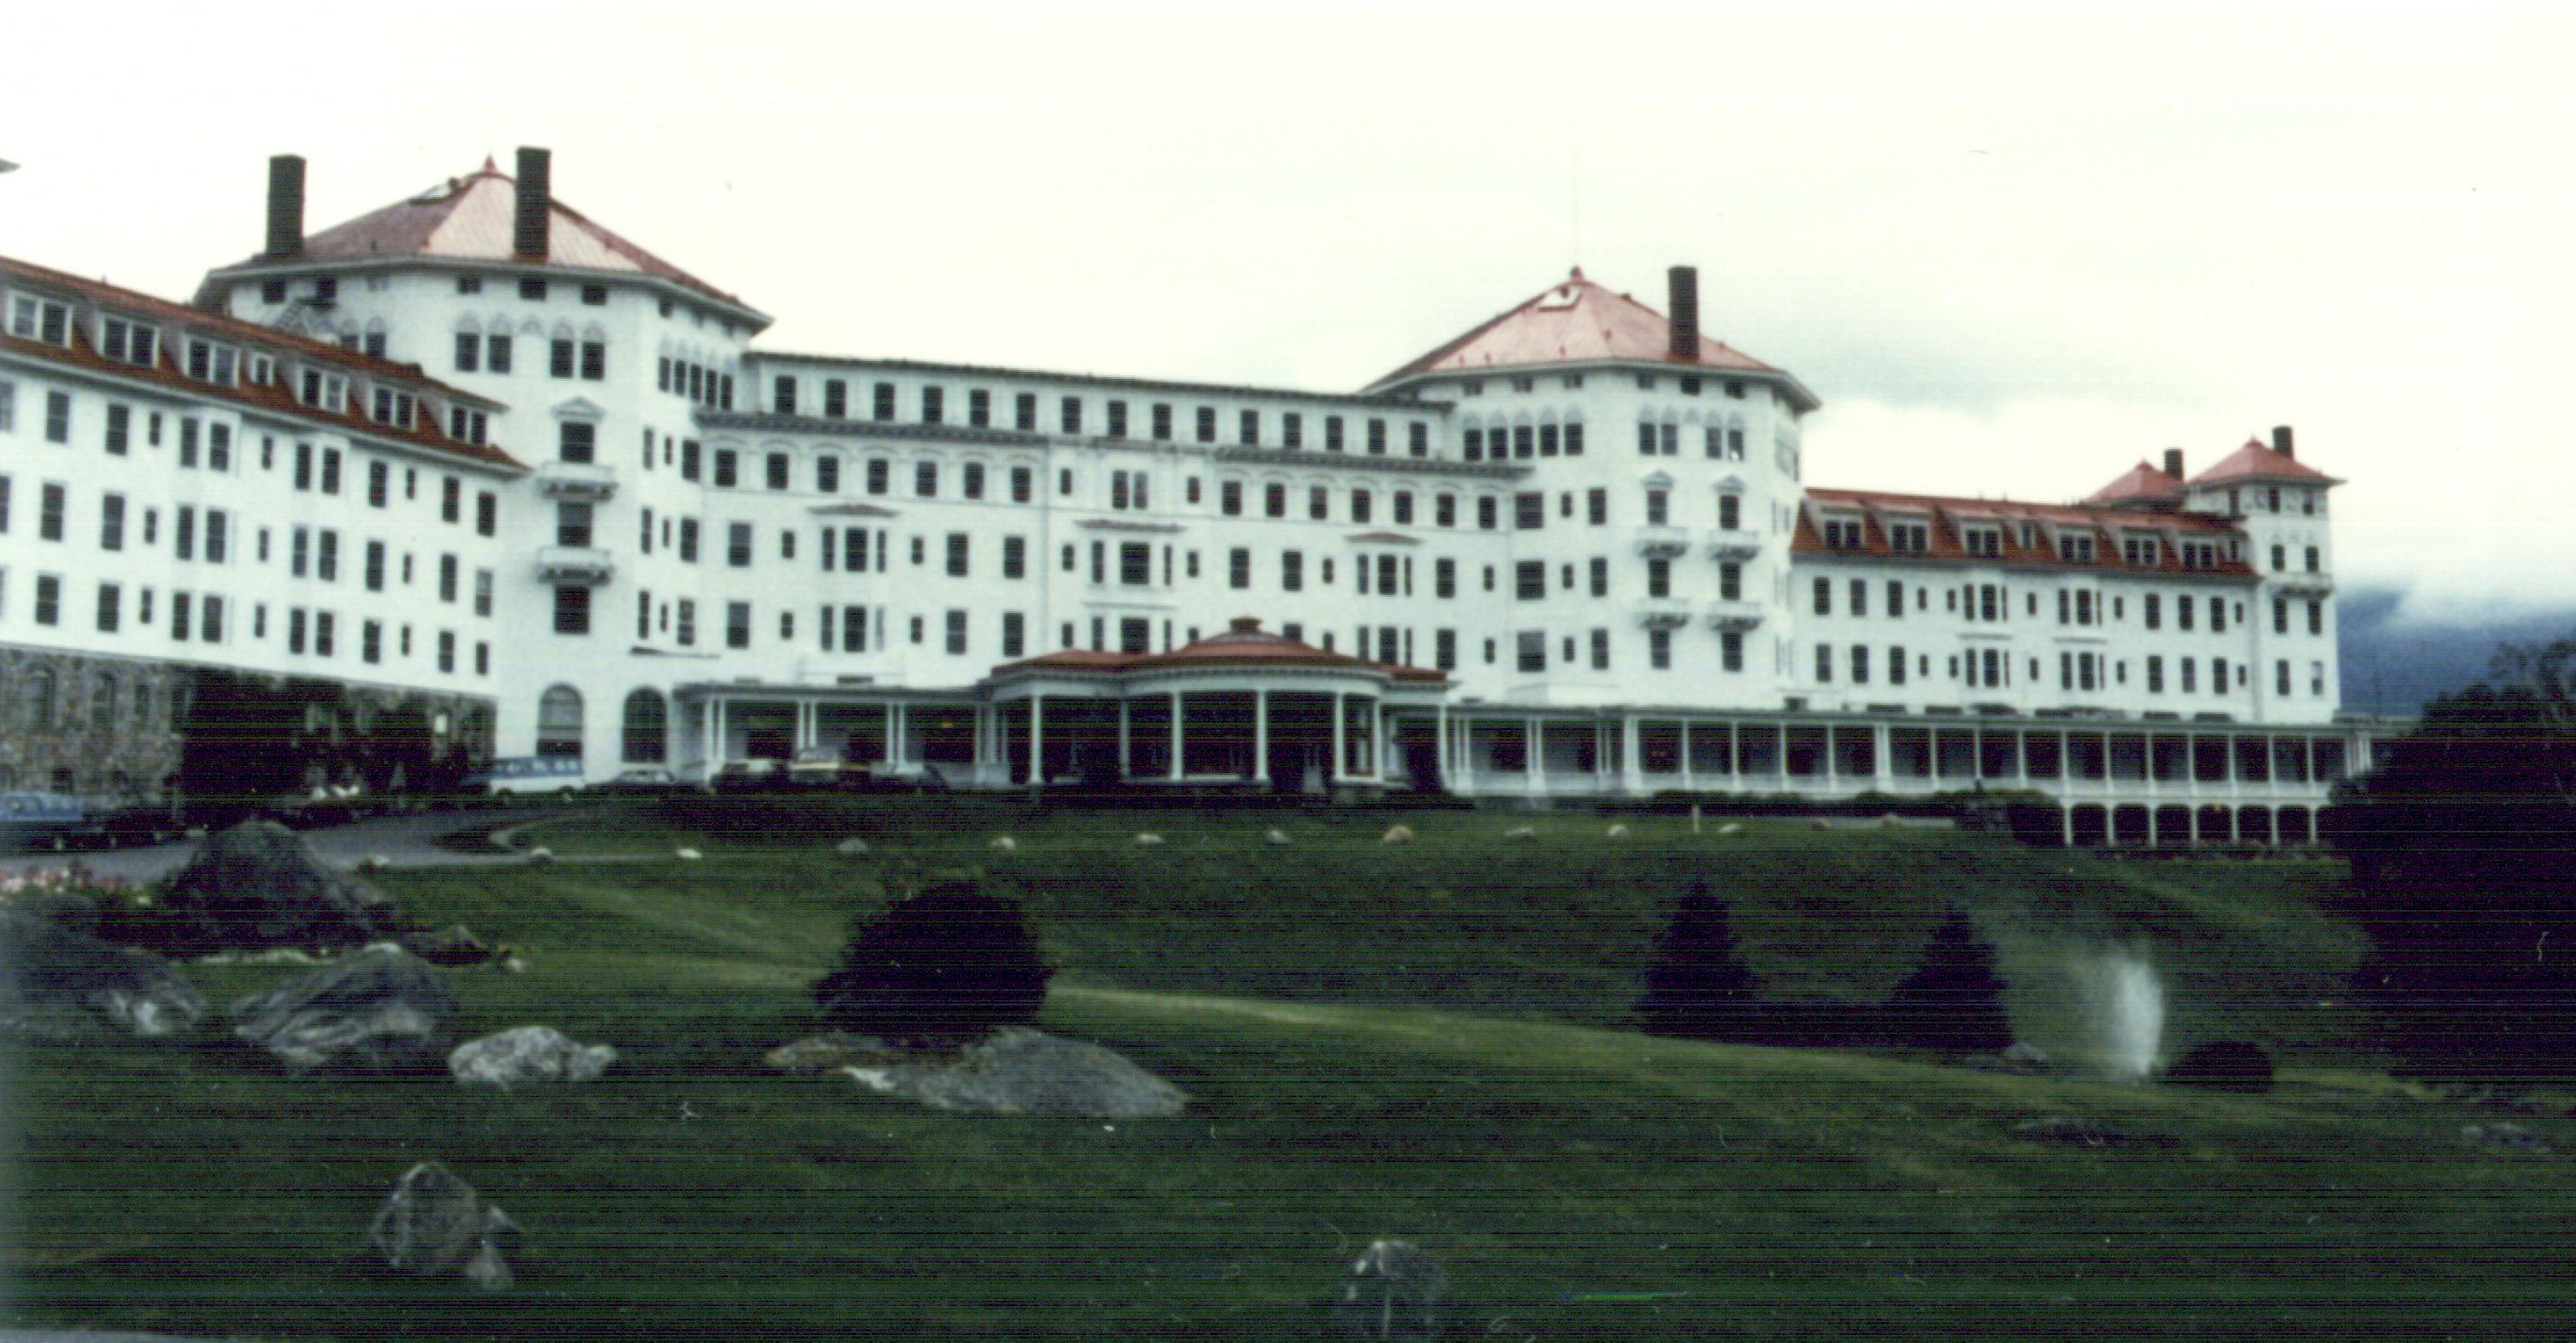 Mount Washington Hotel located at Bretton Woods